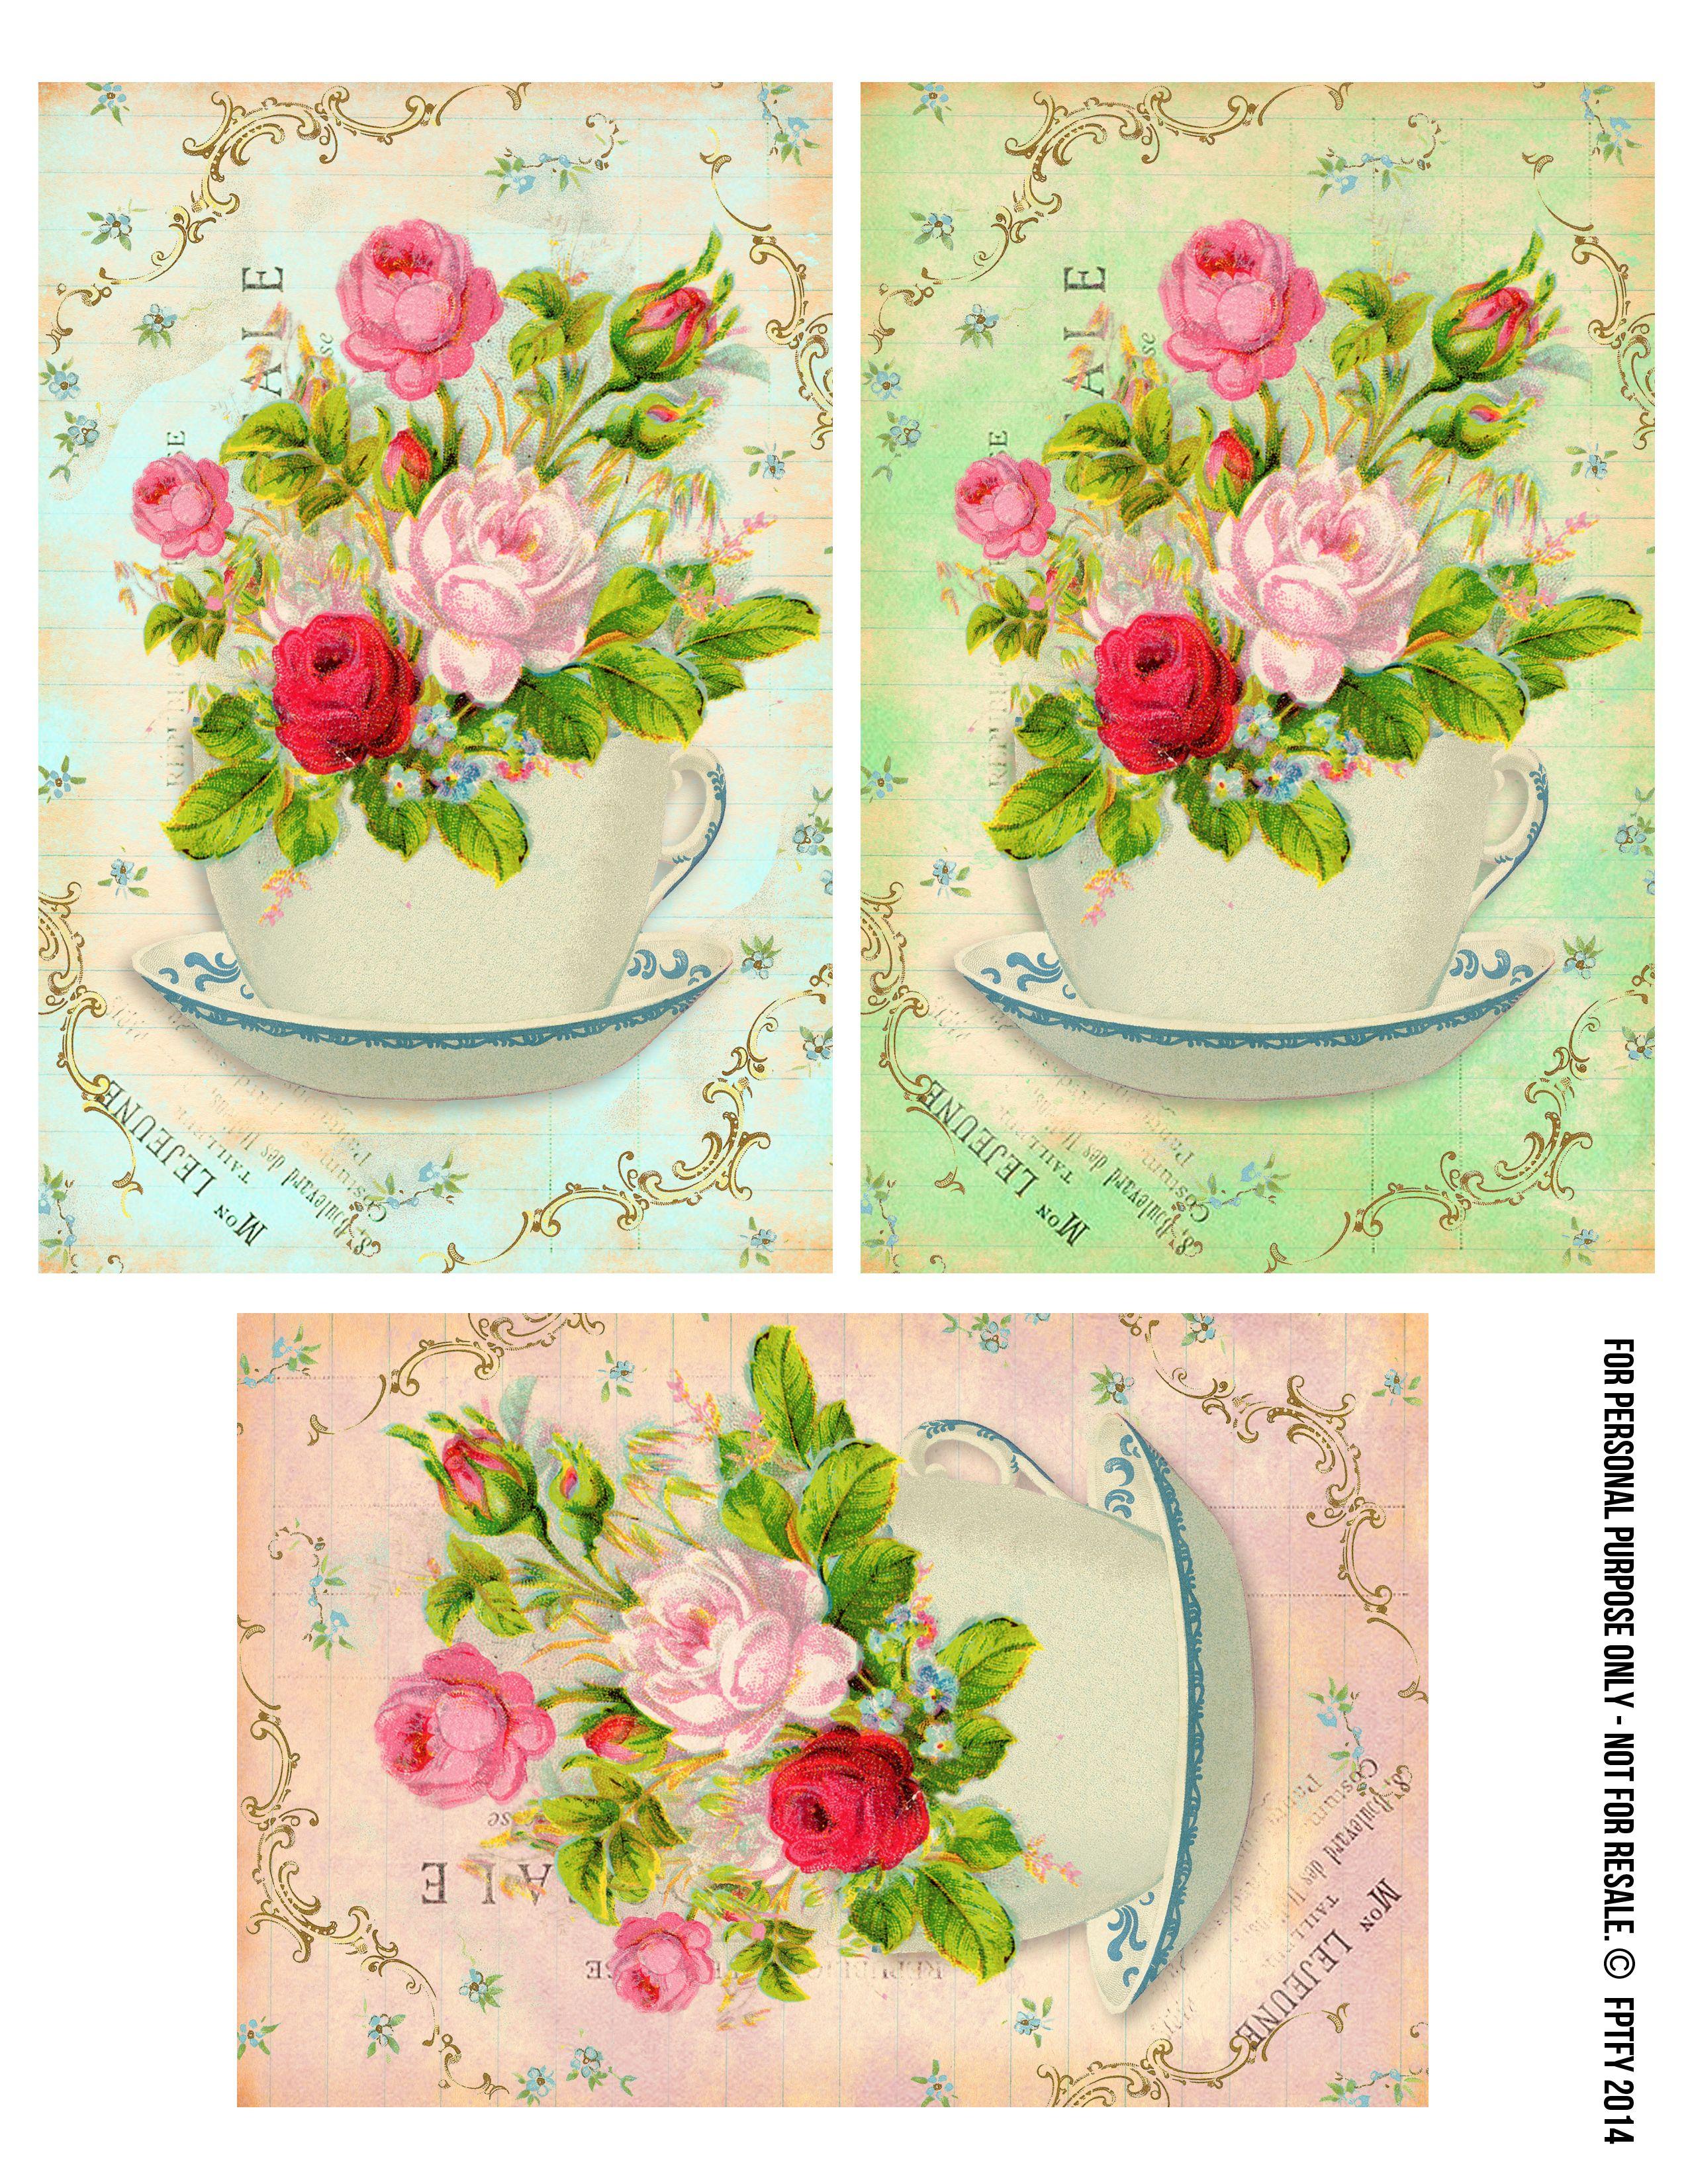 Pin de Anna Kerley en 11 - Floral Printables | Pinterest | Etiquetas ...